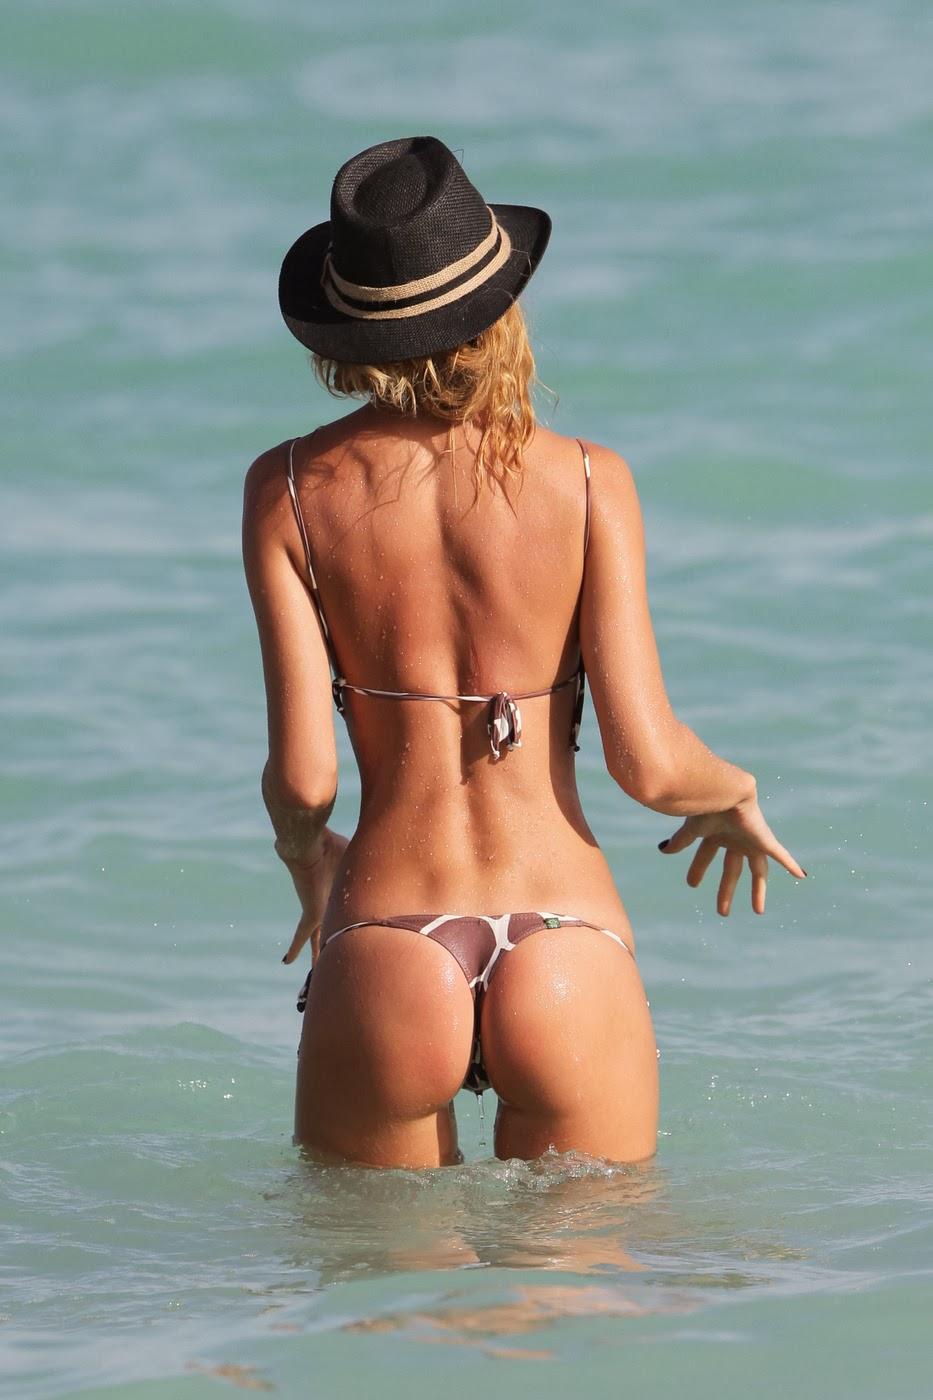 Things Guys Love Thigh Gaps Bikini Bridges Back